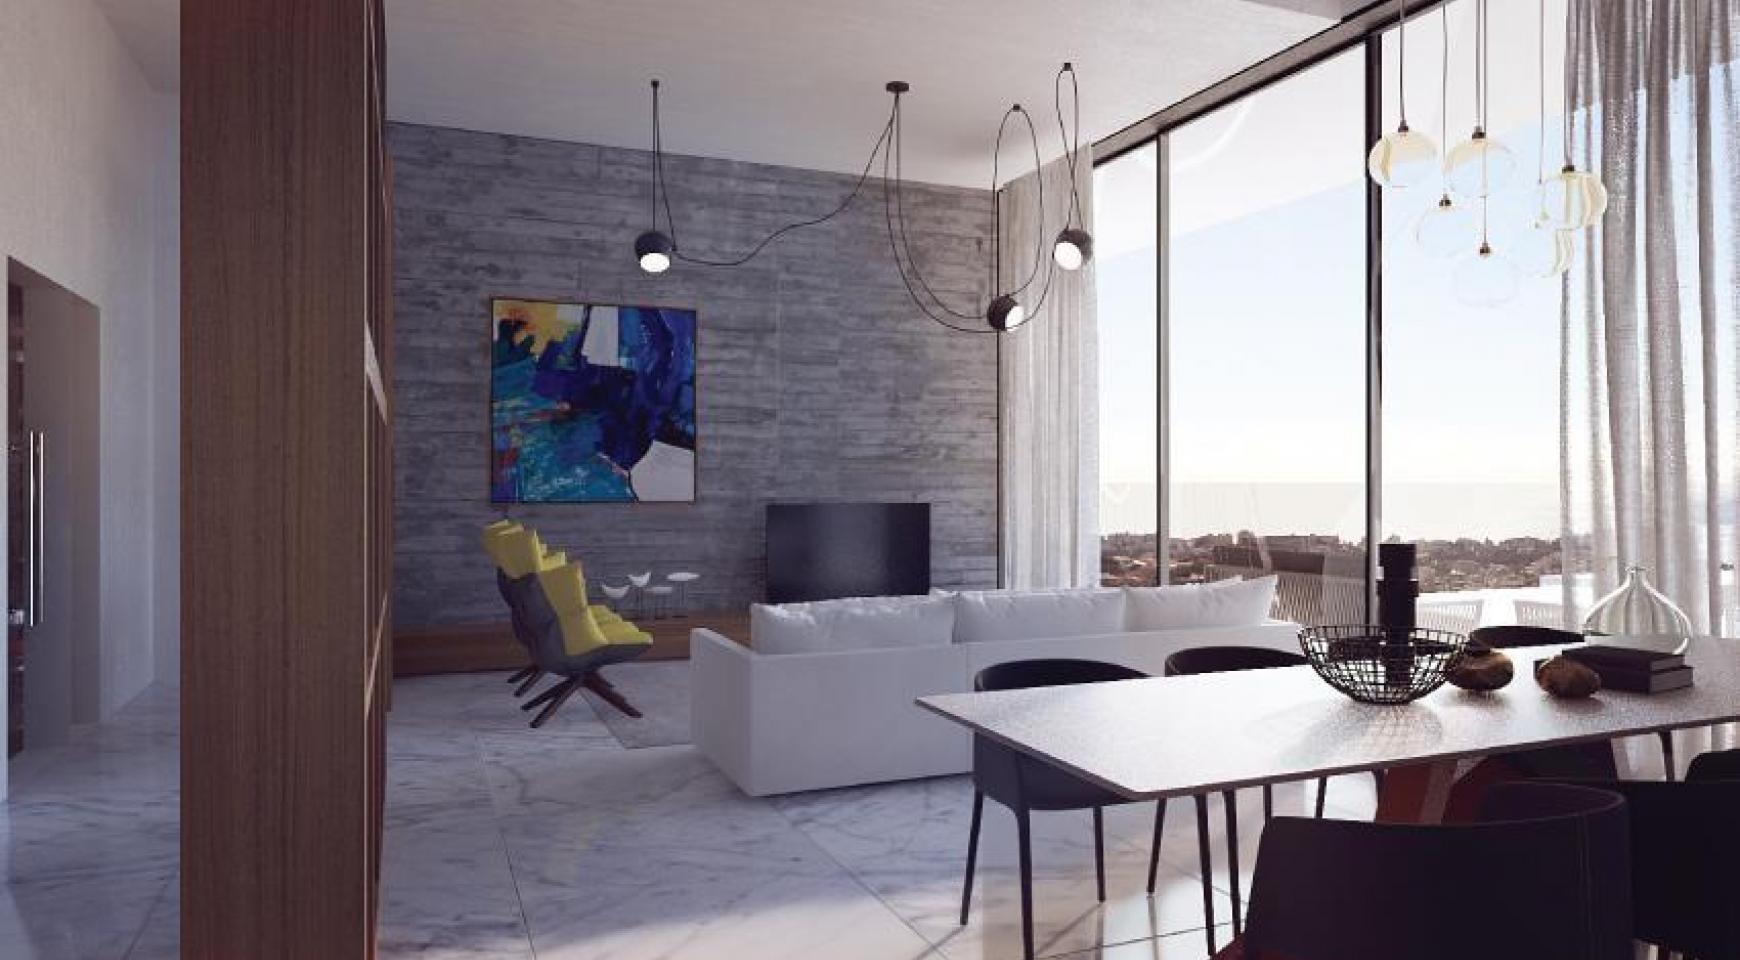 Exclusive 3 Bedroom Villa with Stunning Views in Germasogeia - 6